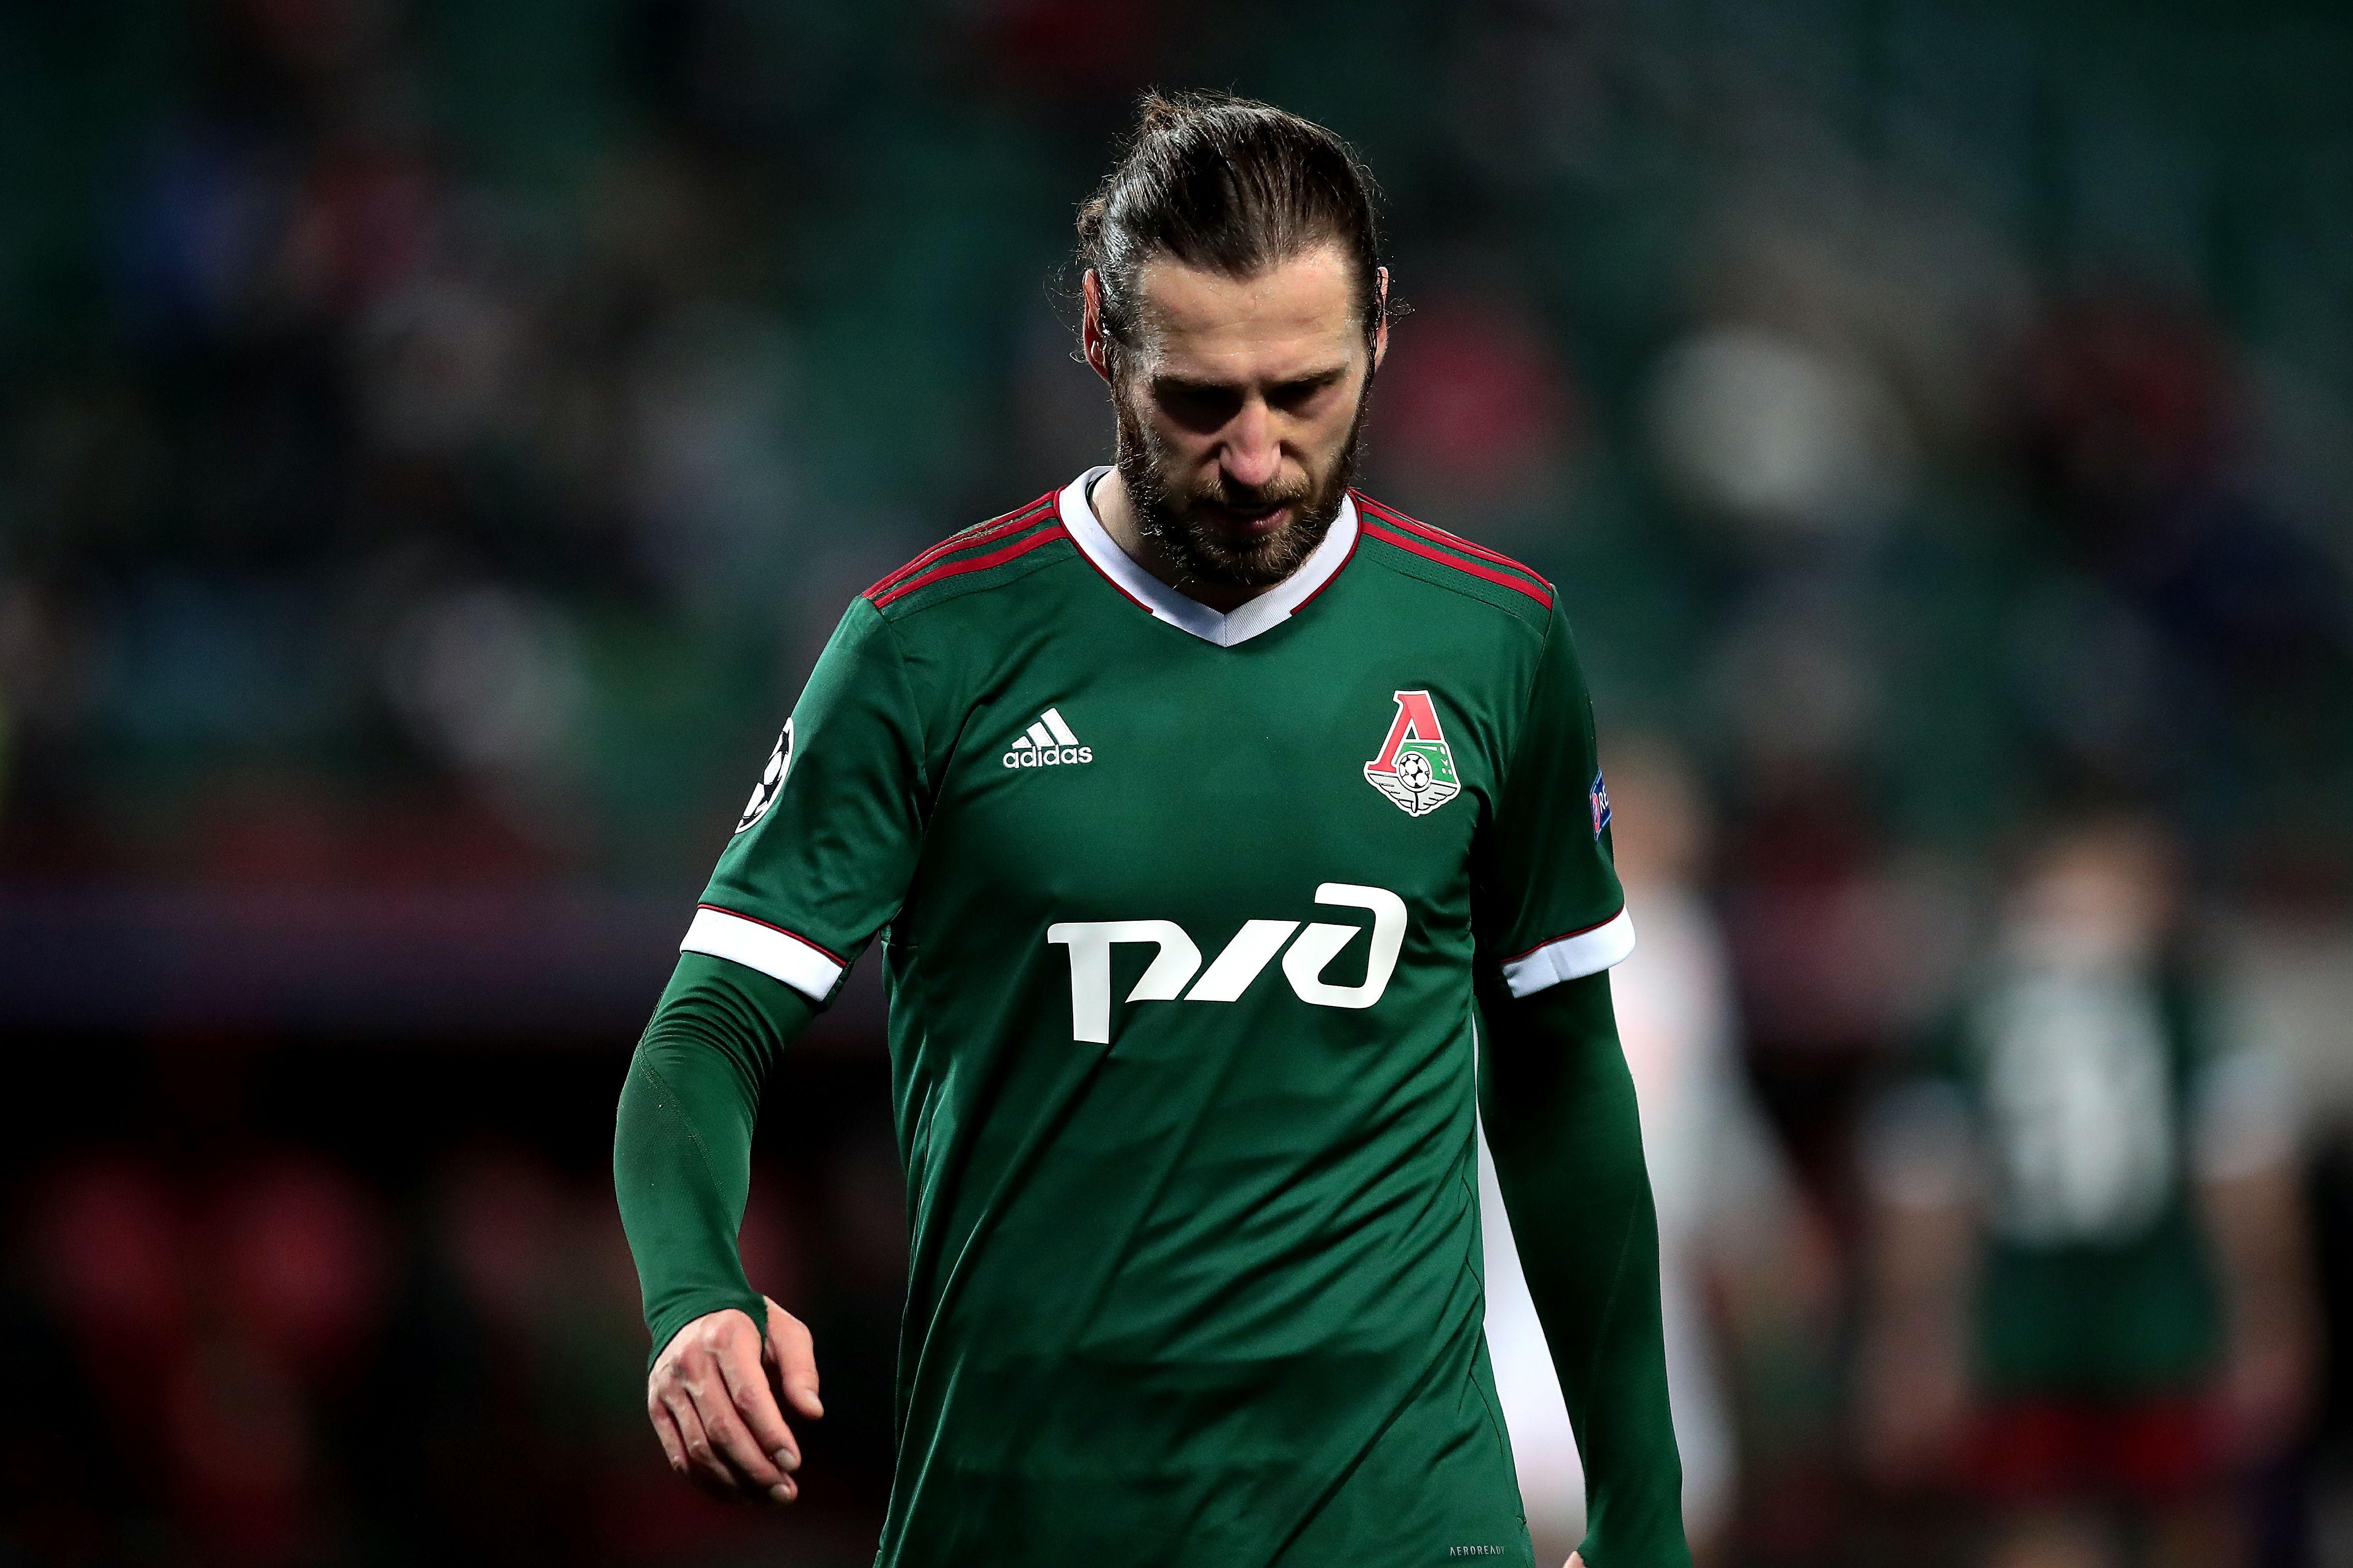 Футбол, РПЛ, Ротор - Локомотив, прямая текстовая онлайн трансляция